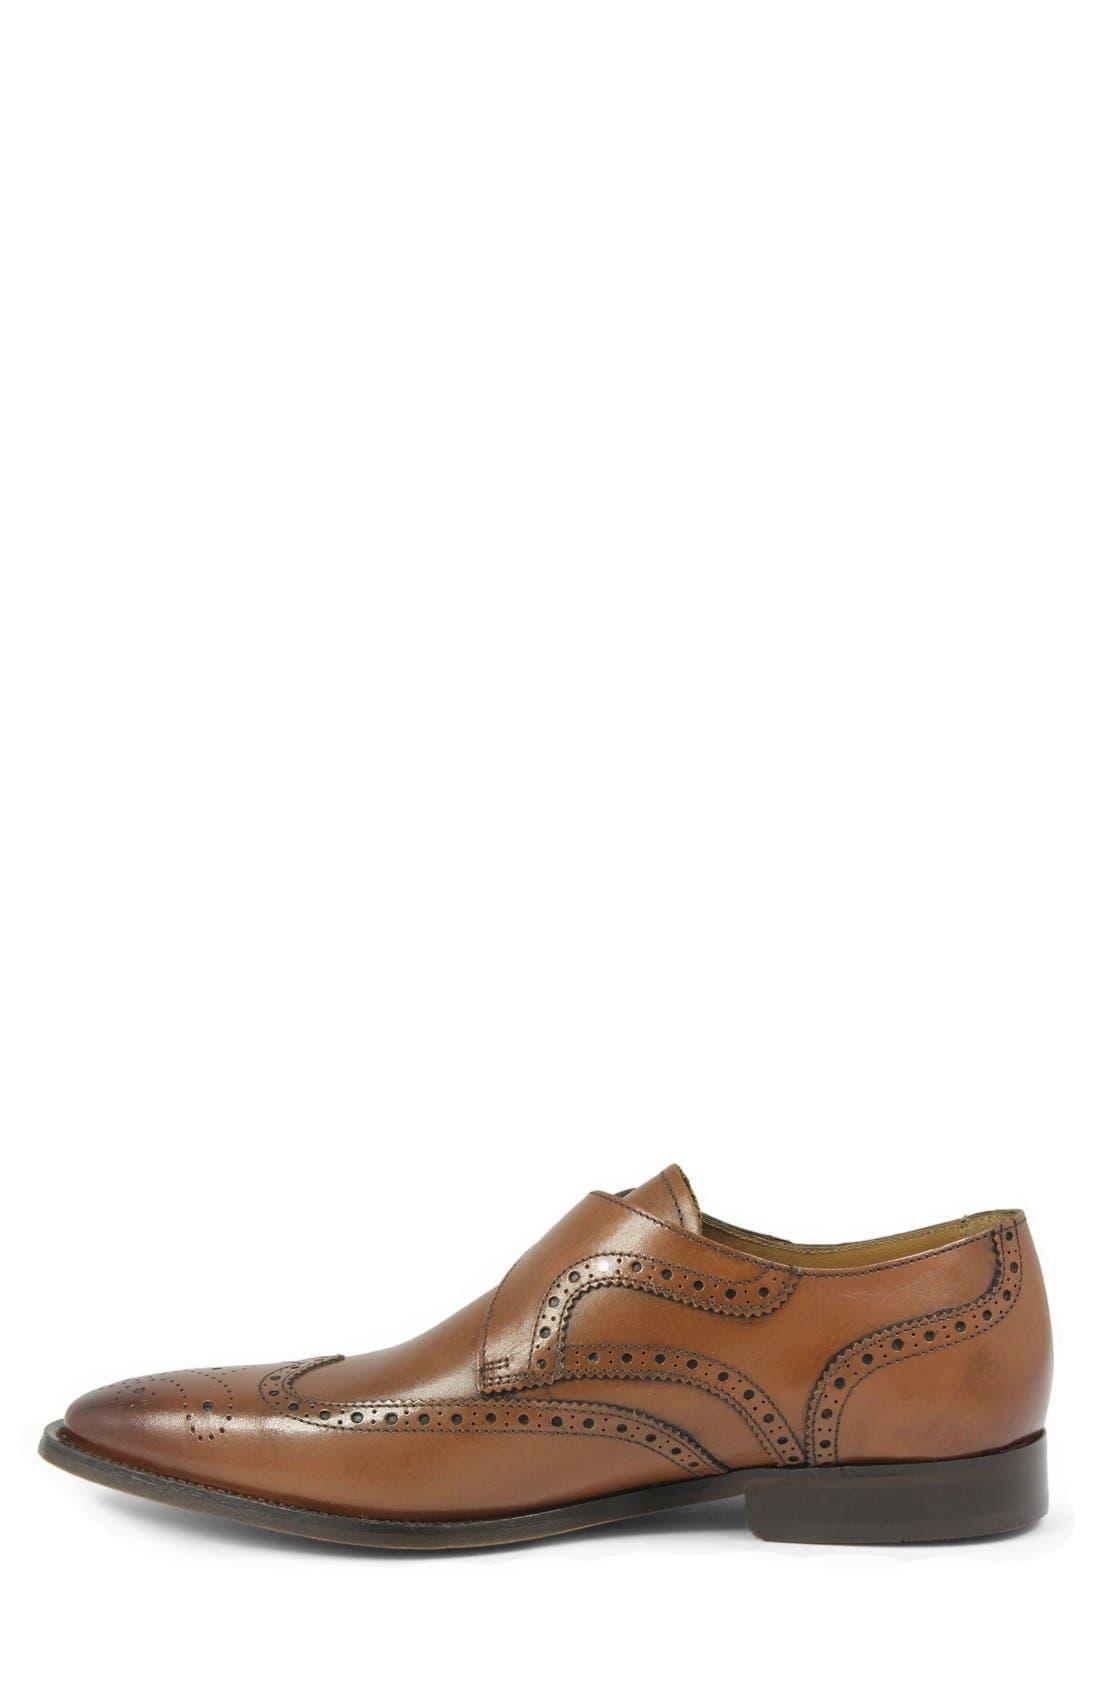 'Sabato' Wingtip Monk Strap Shoe,                             Alternate thumbnail 2, color,                             MEDIUM BROWN